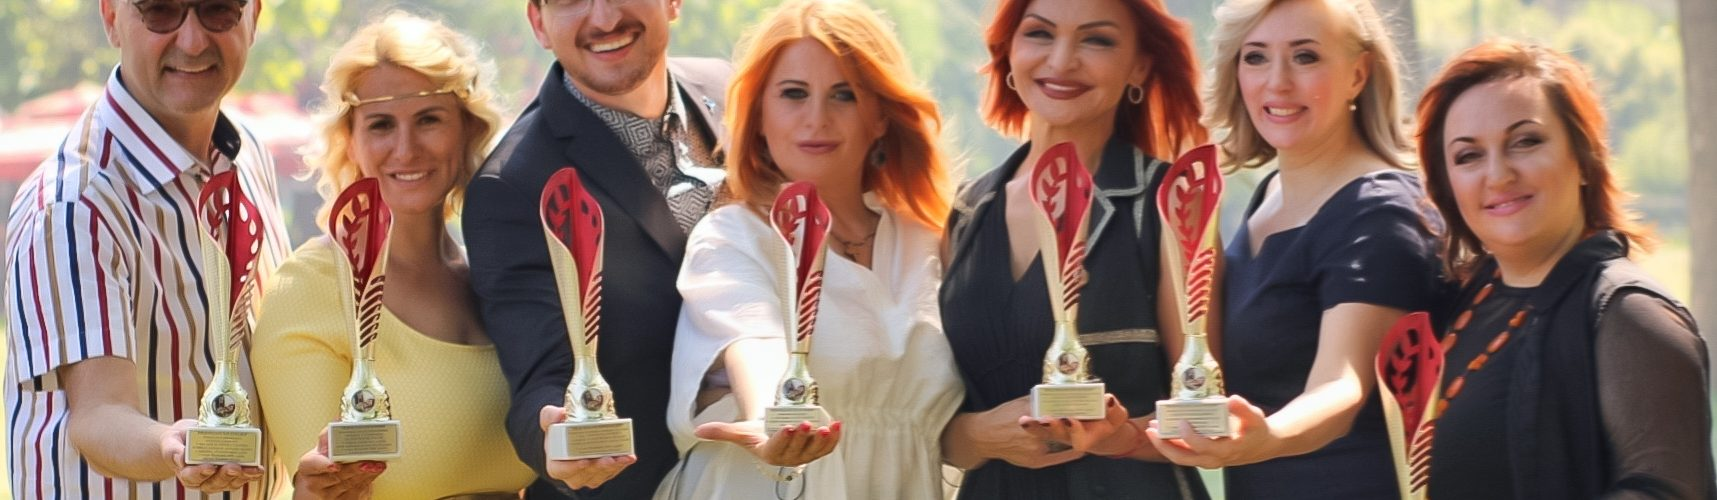 Vidovdanska priznanja u rukama zvezda Radio Beograda!